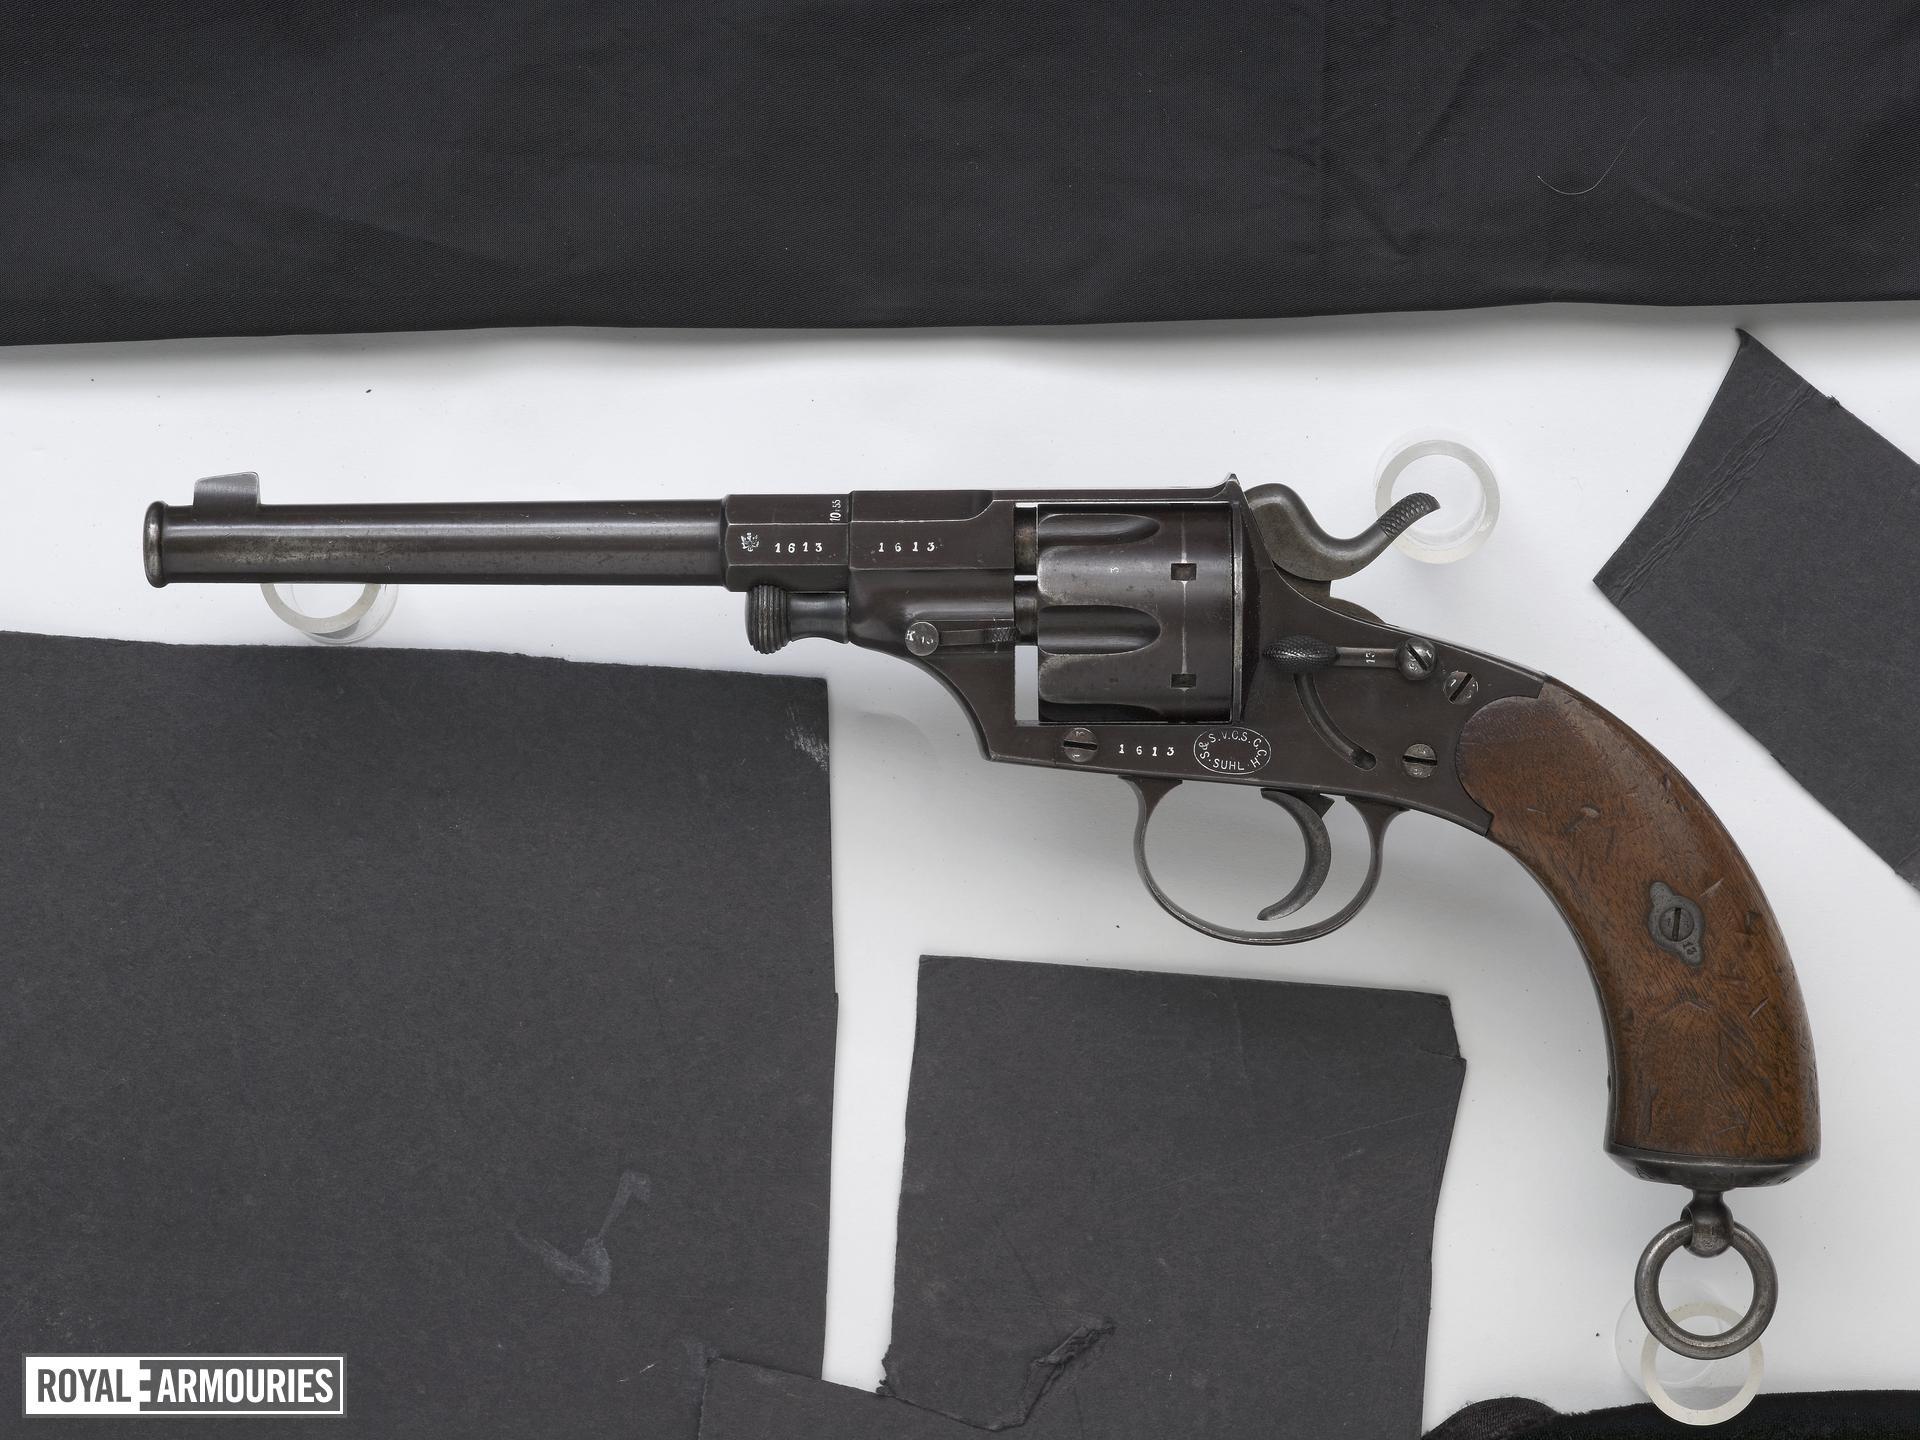 Centrefire six-shot revolver - Ordnance Model 79